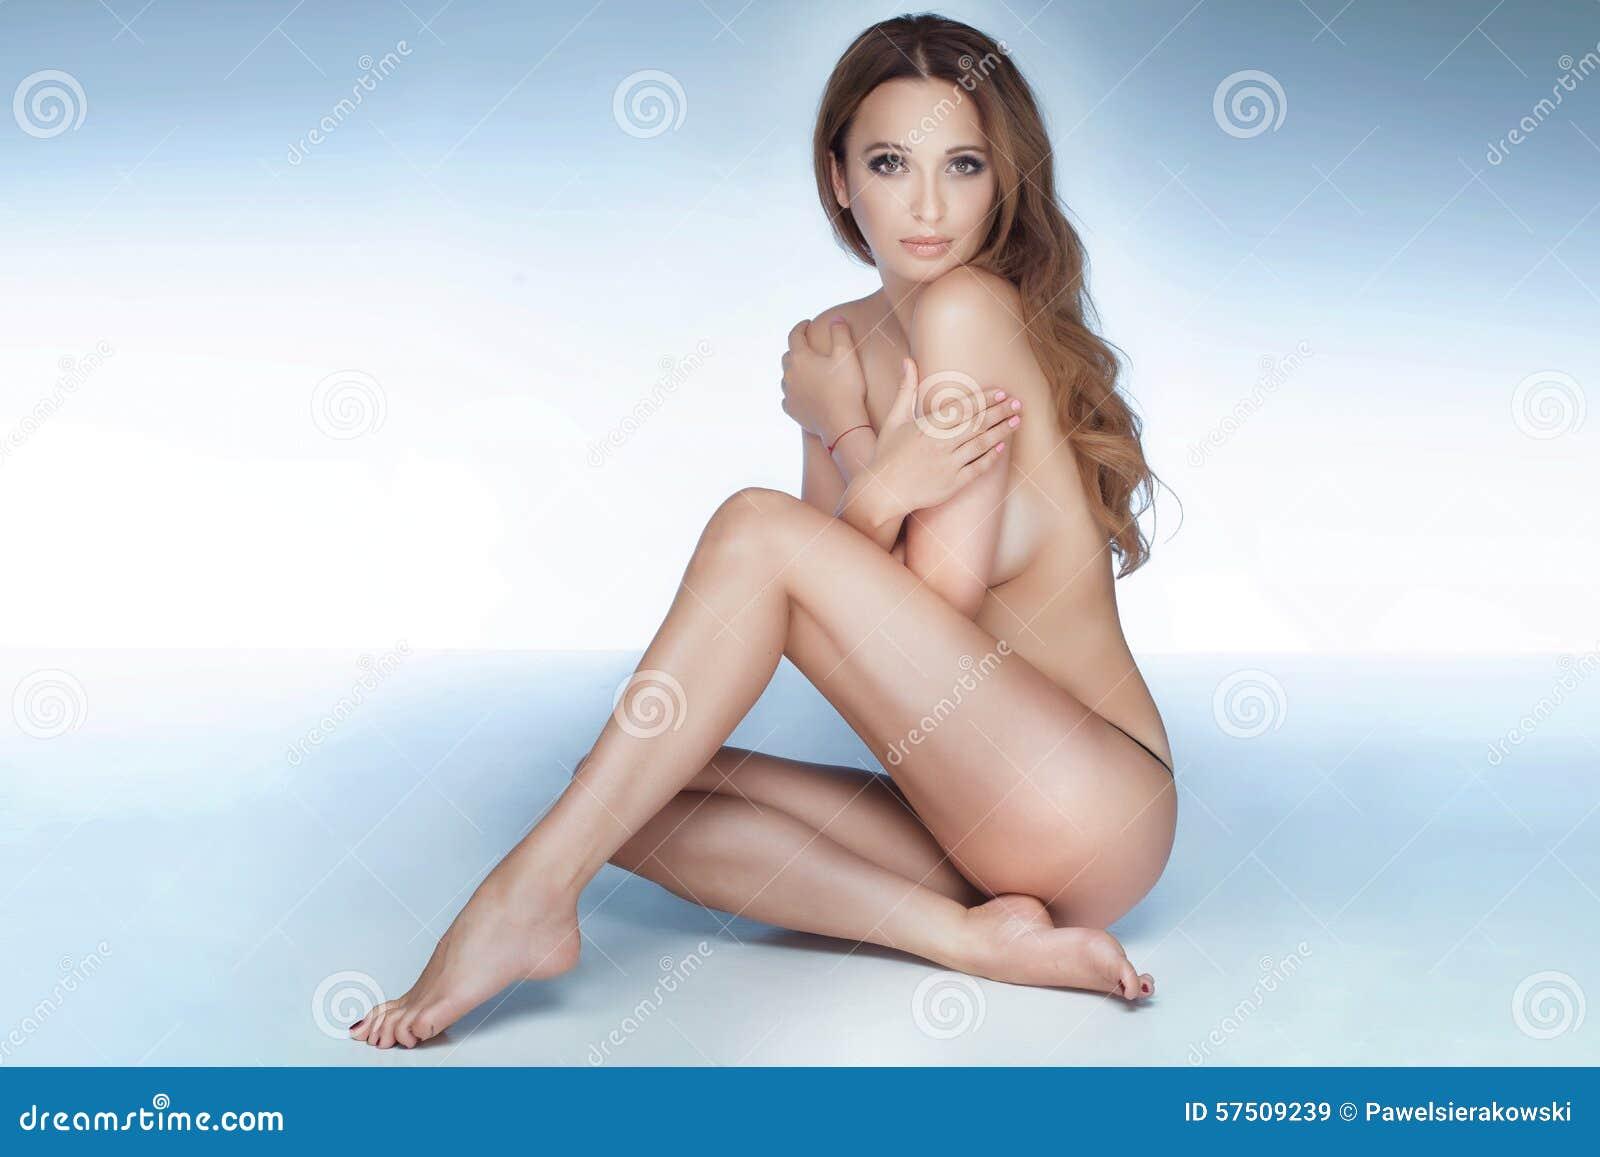 kerry and cassandra nude